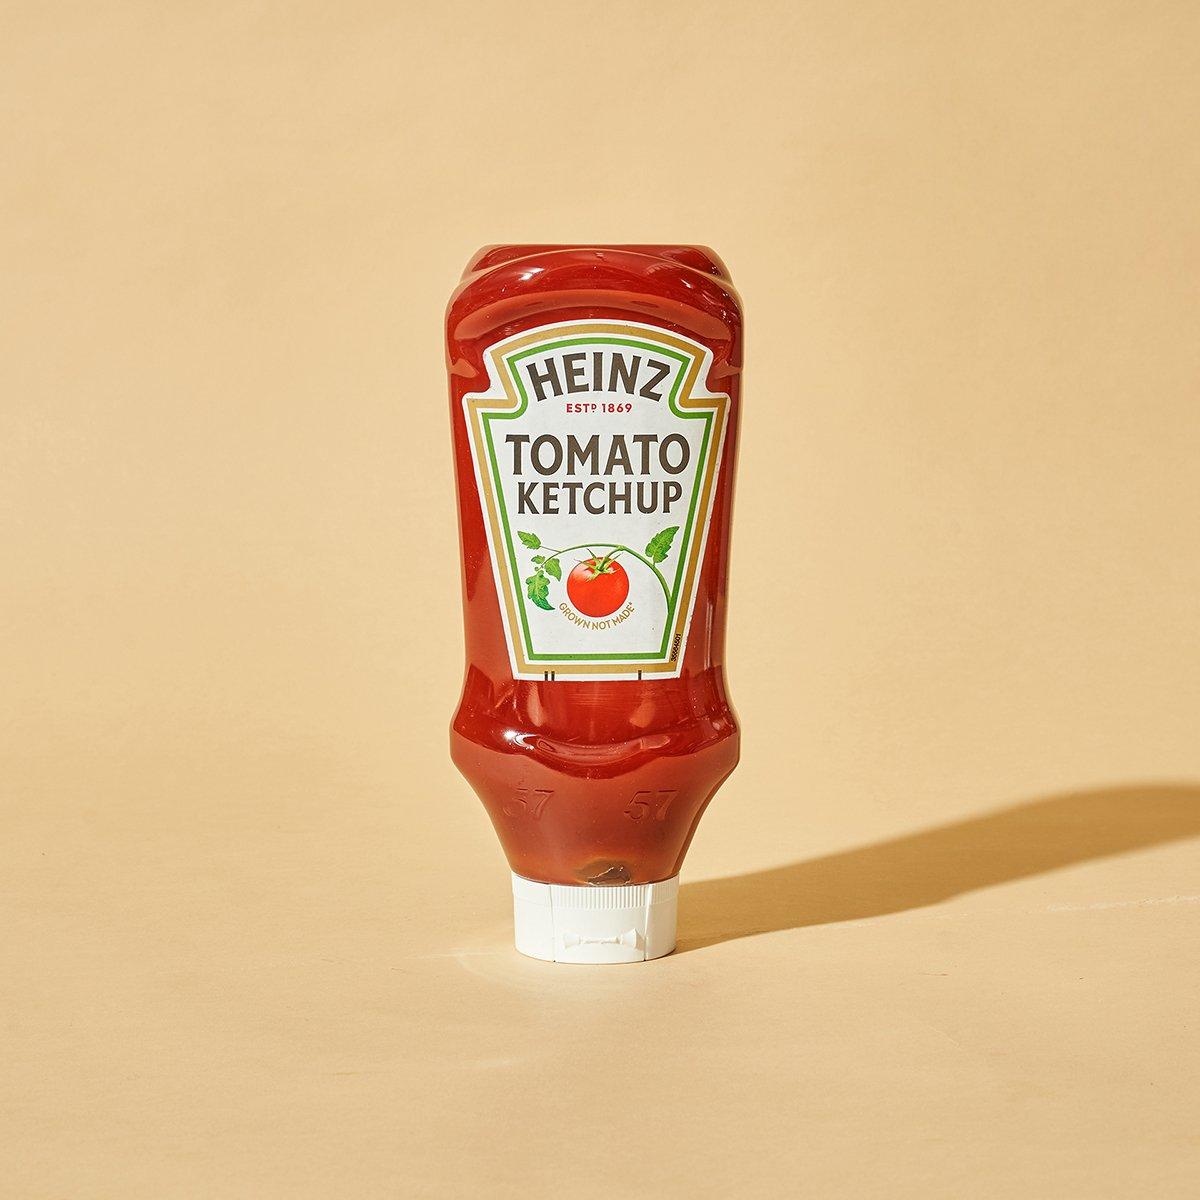 [Heinz]하인즈 토마토케찹 910g